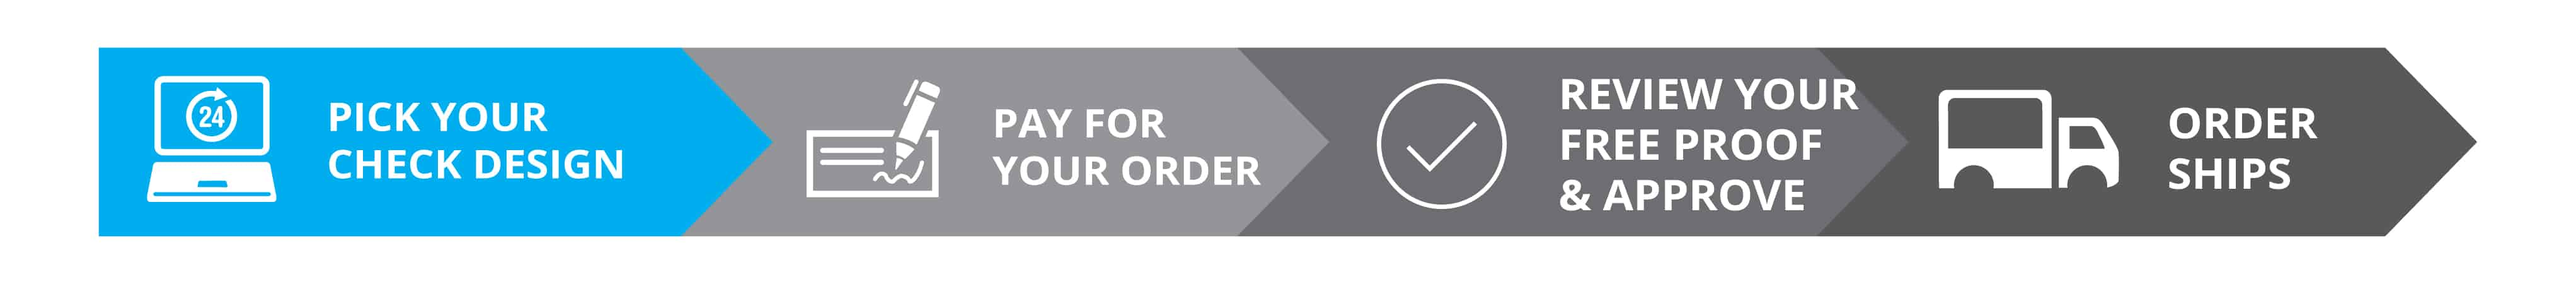 check_print_order_steps-1